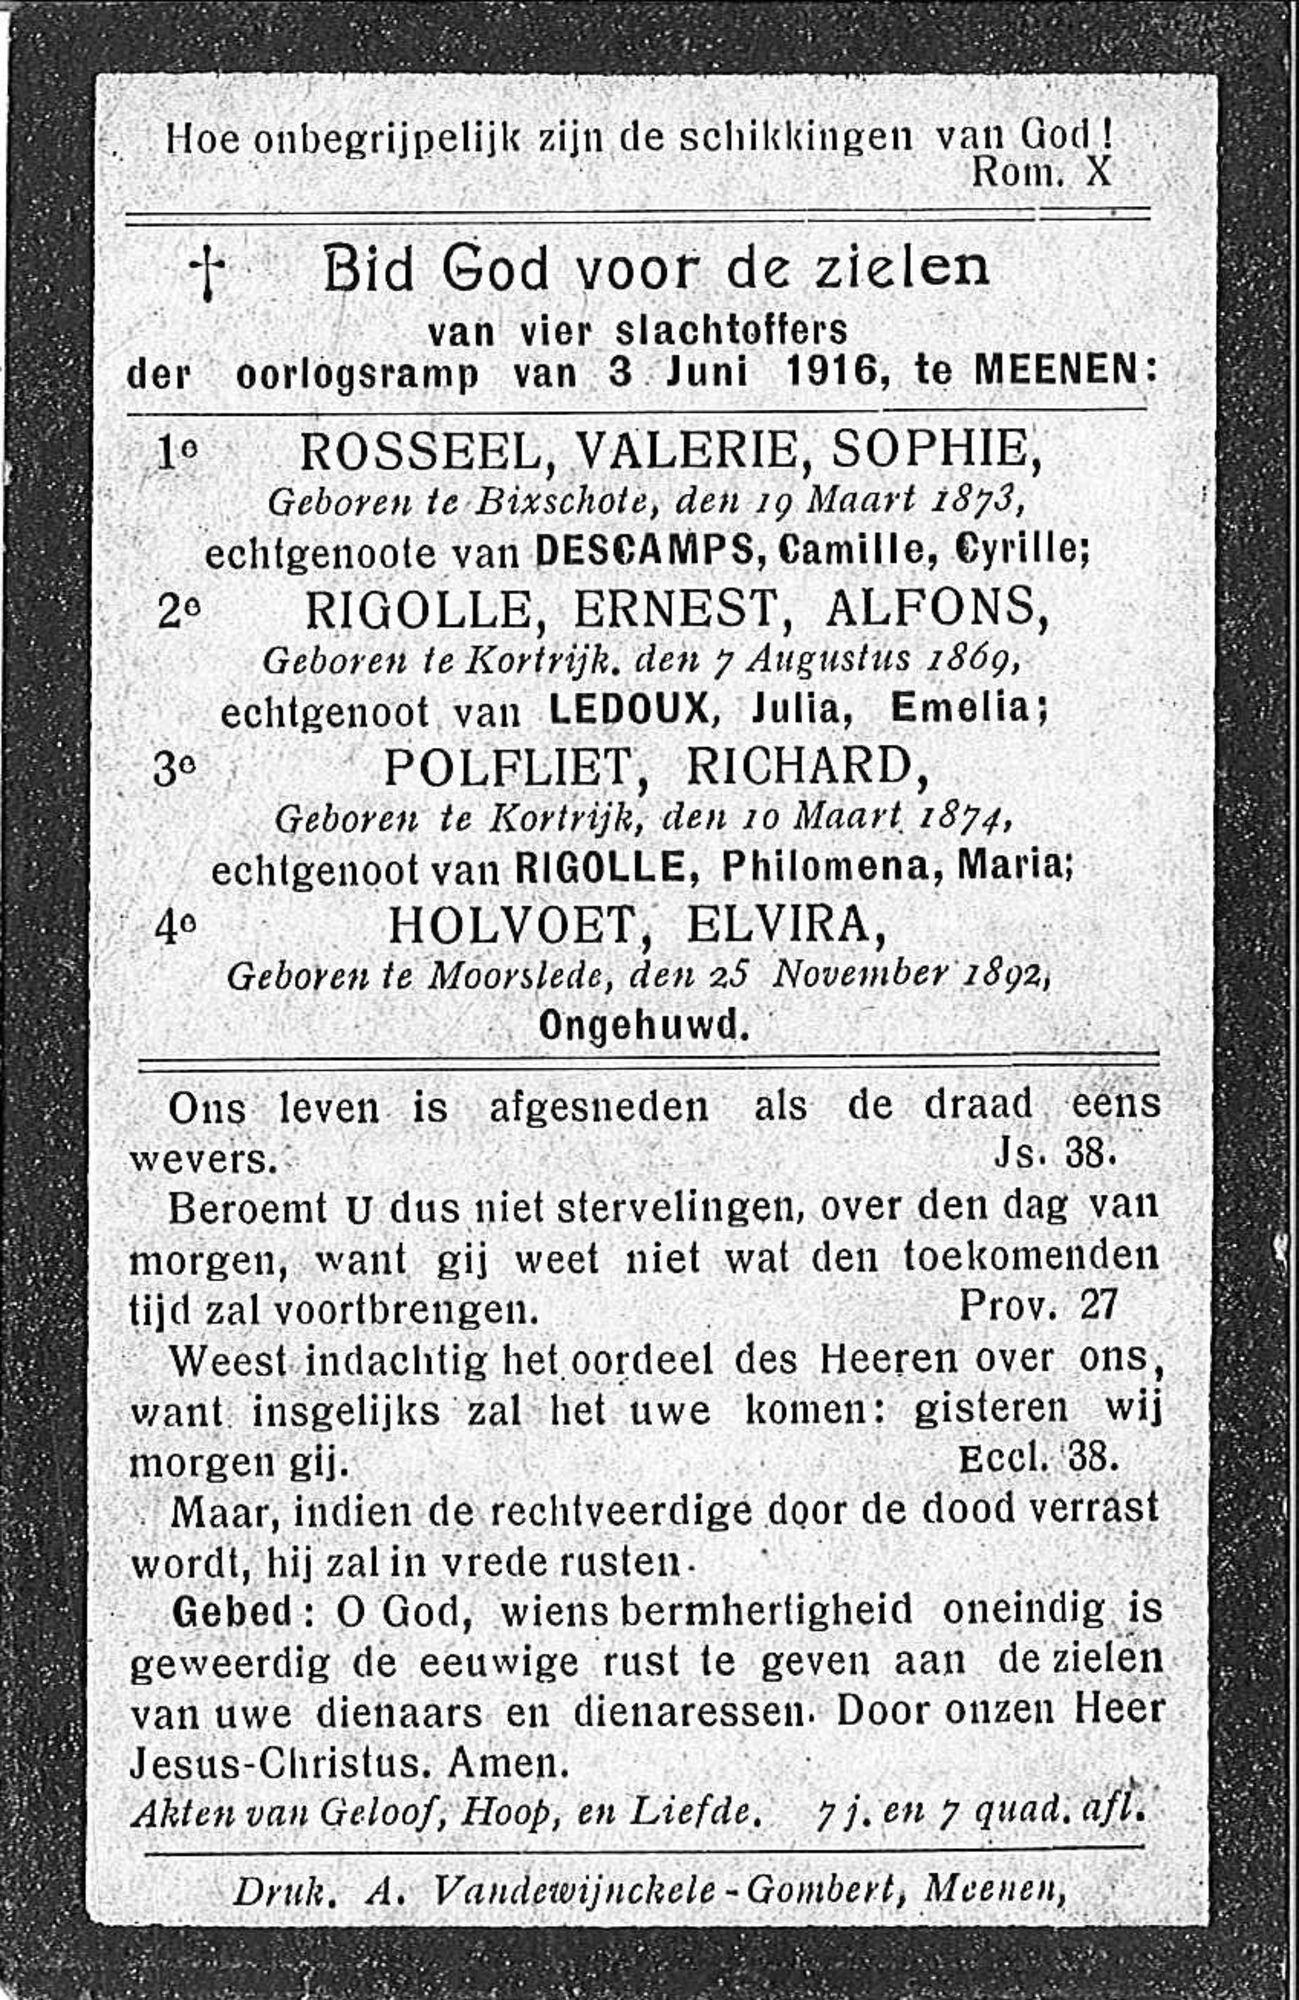 Ernest-Alfons Rigolle